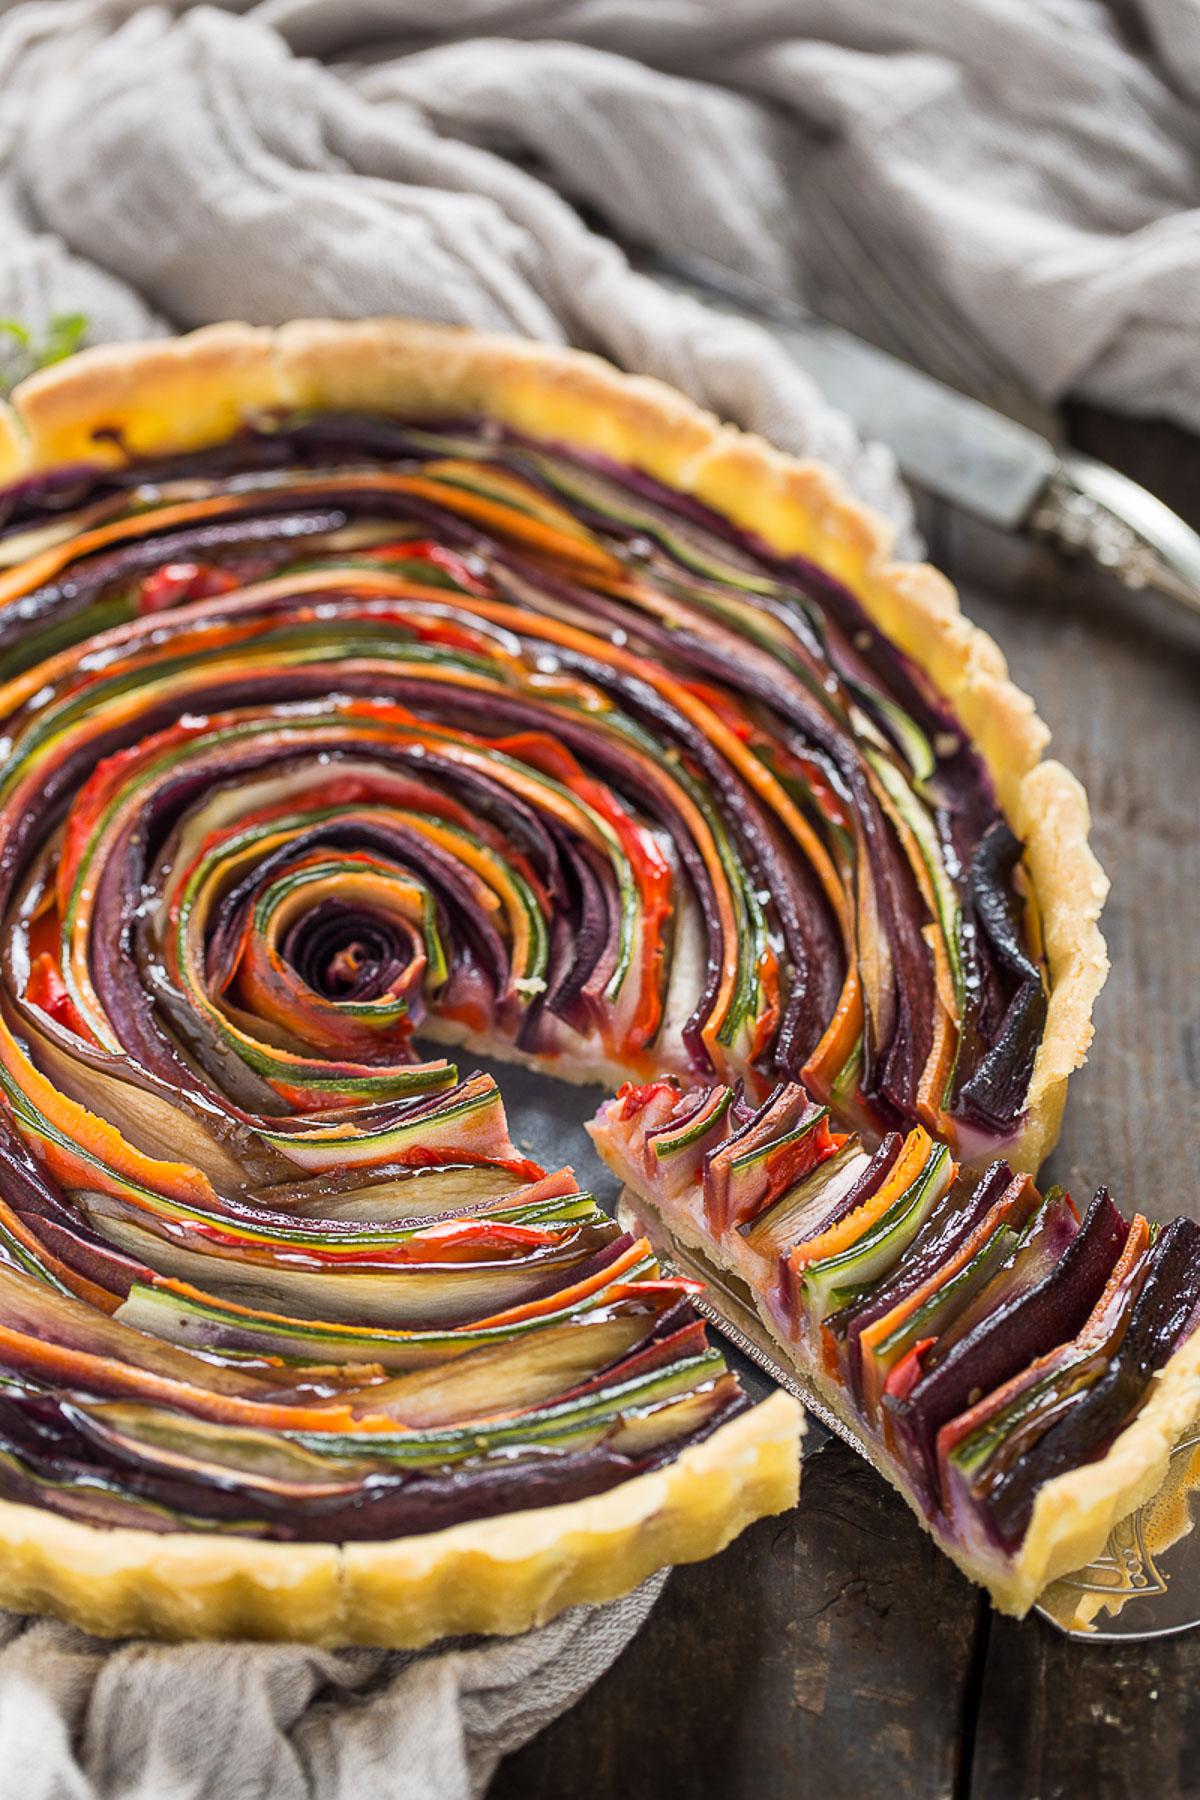 torta salata di verdure a spirale senza glutine senza uova senza burro #vegan | vegan #glutenfree vegetable spiral tart slice